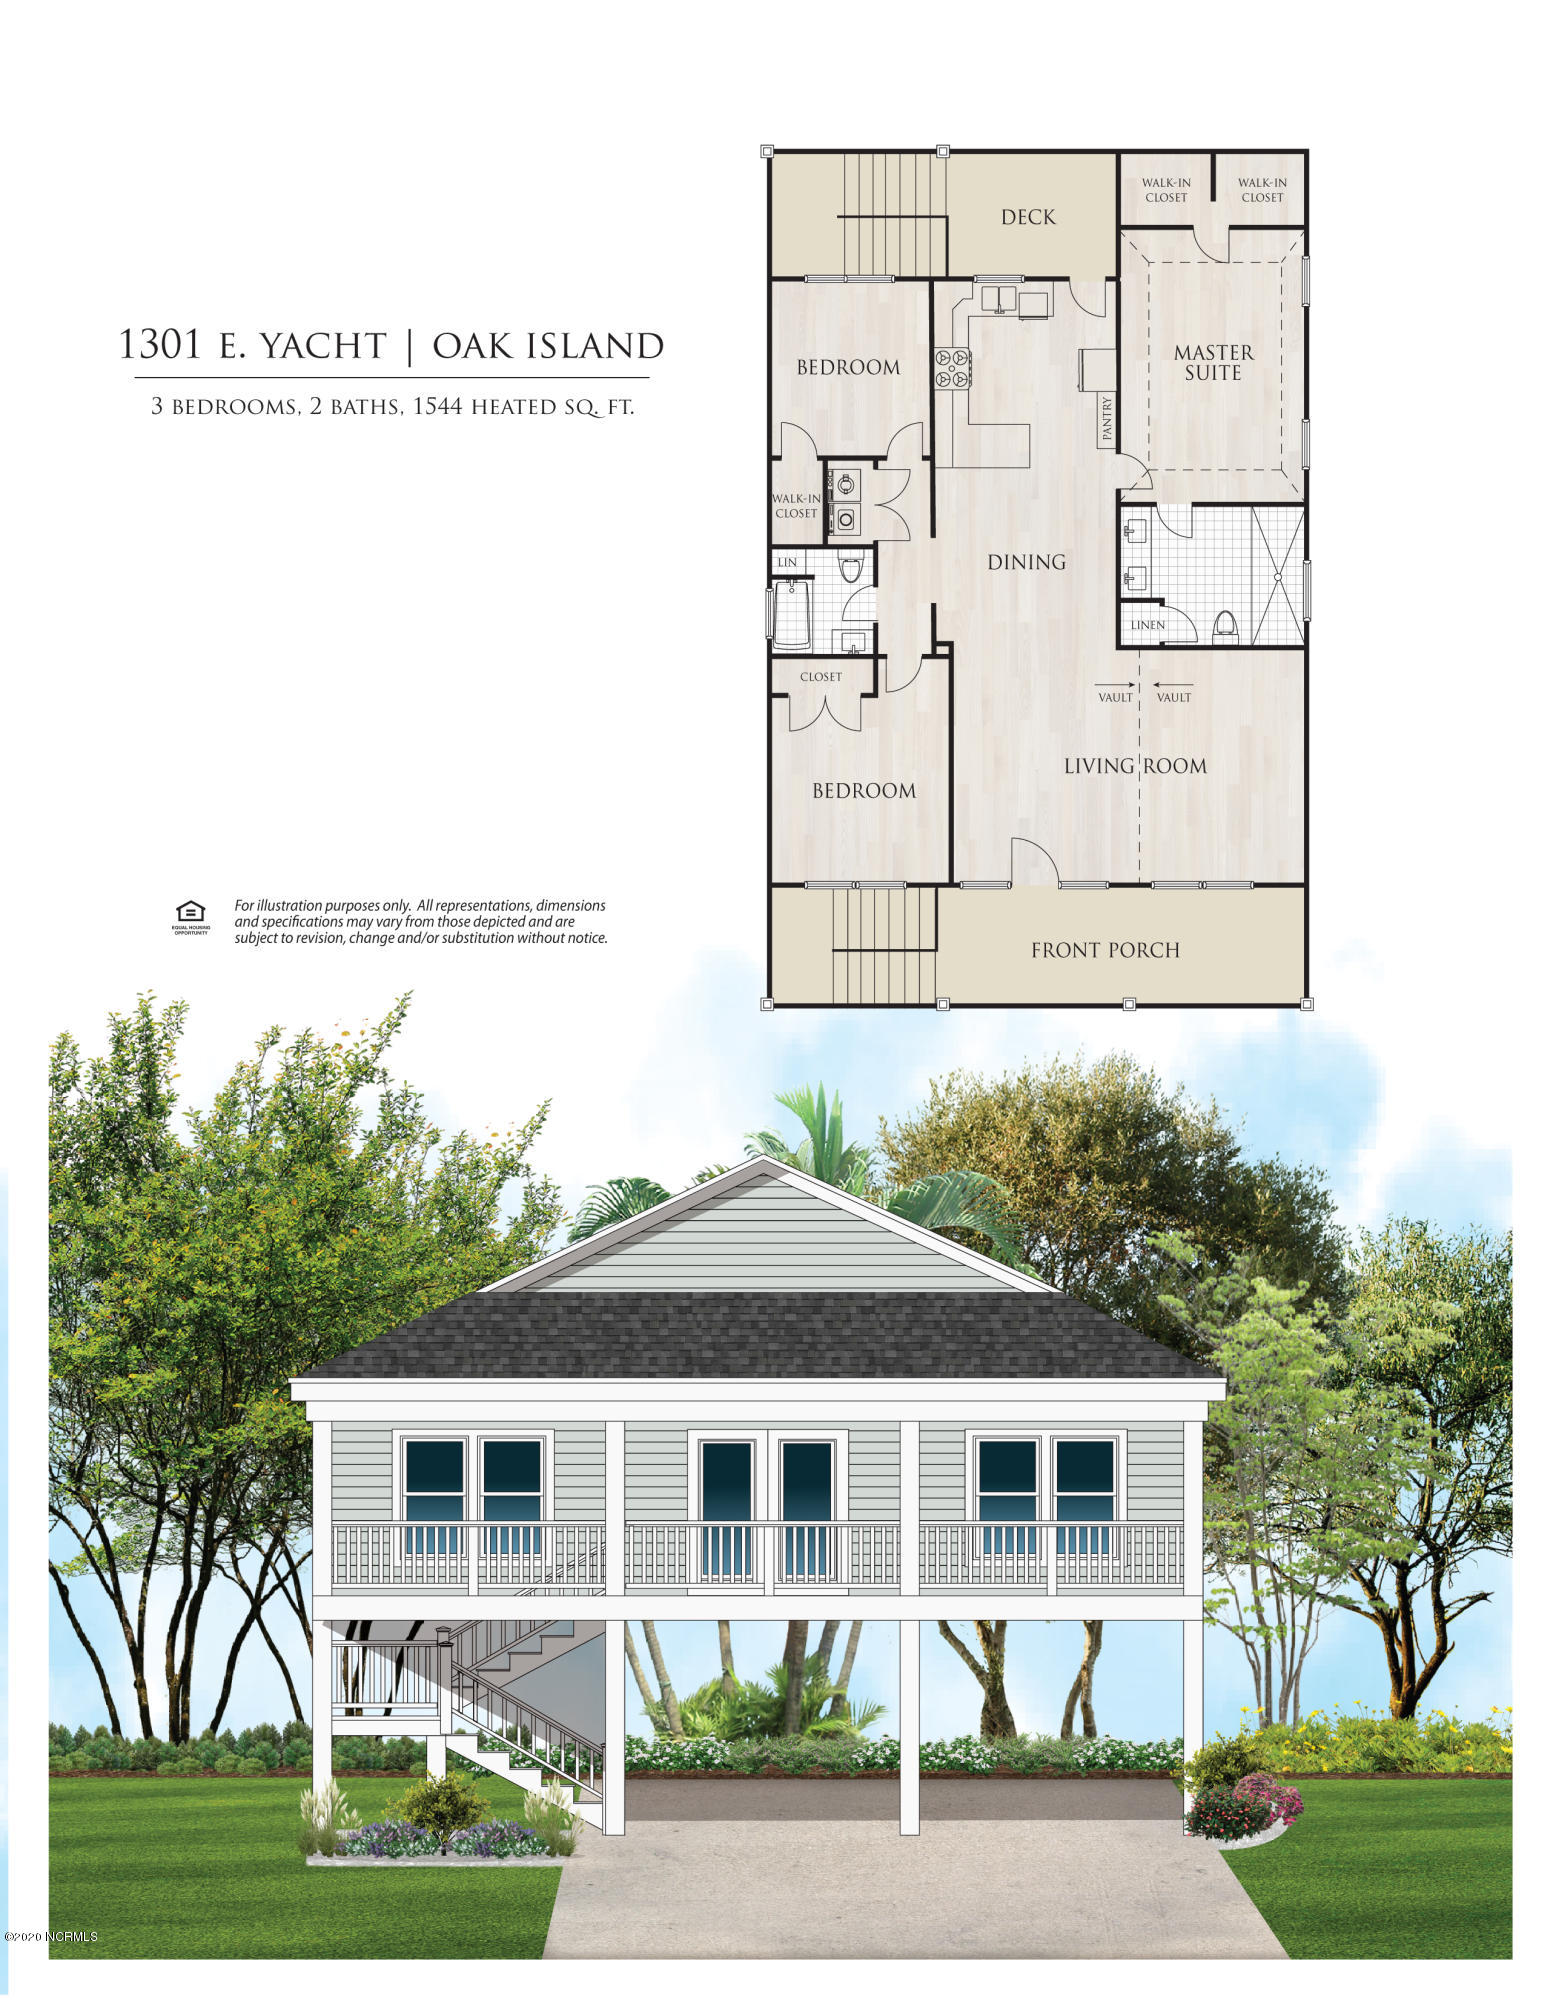 1301 E Yacht Drive Oak Island, NC 28465